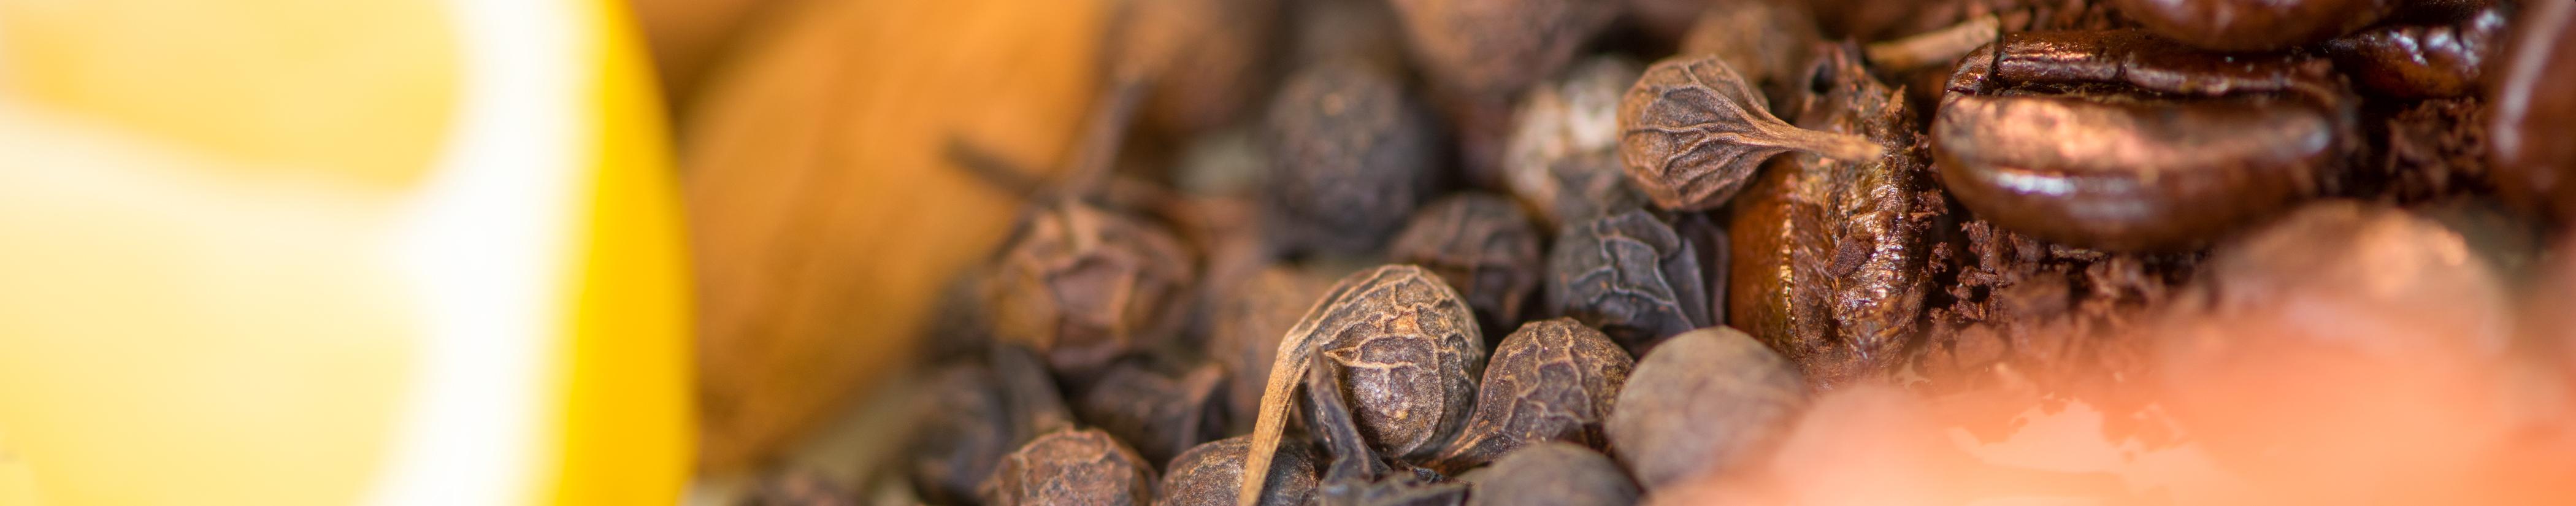 lemon coffee blossom olive stone scrub